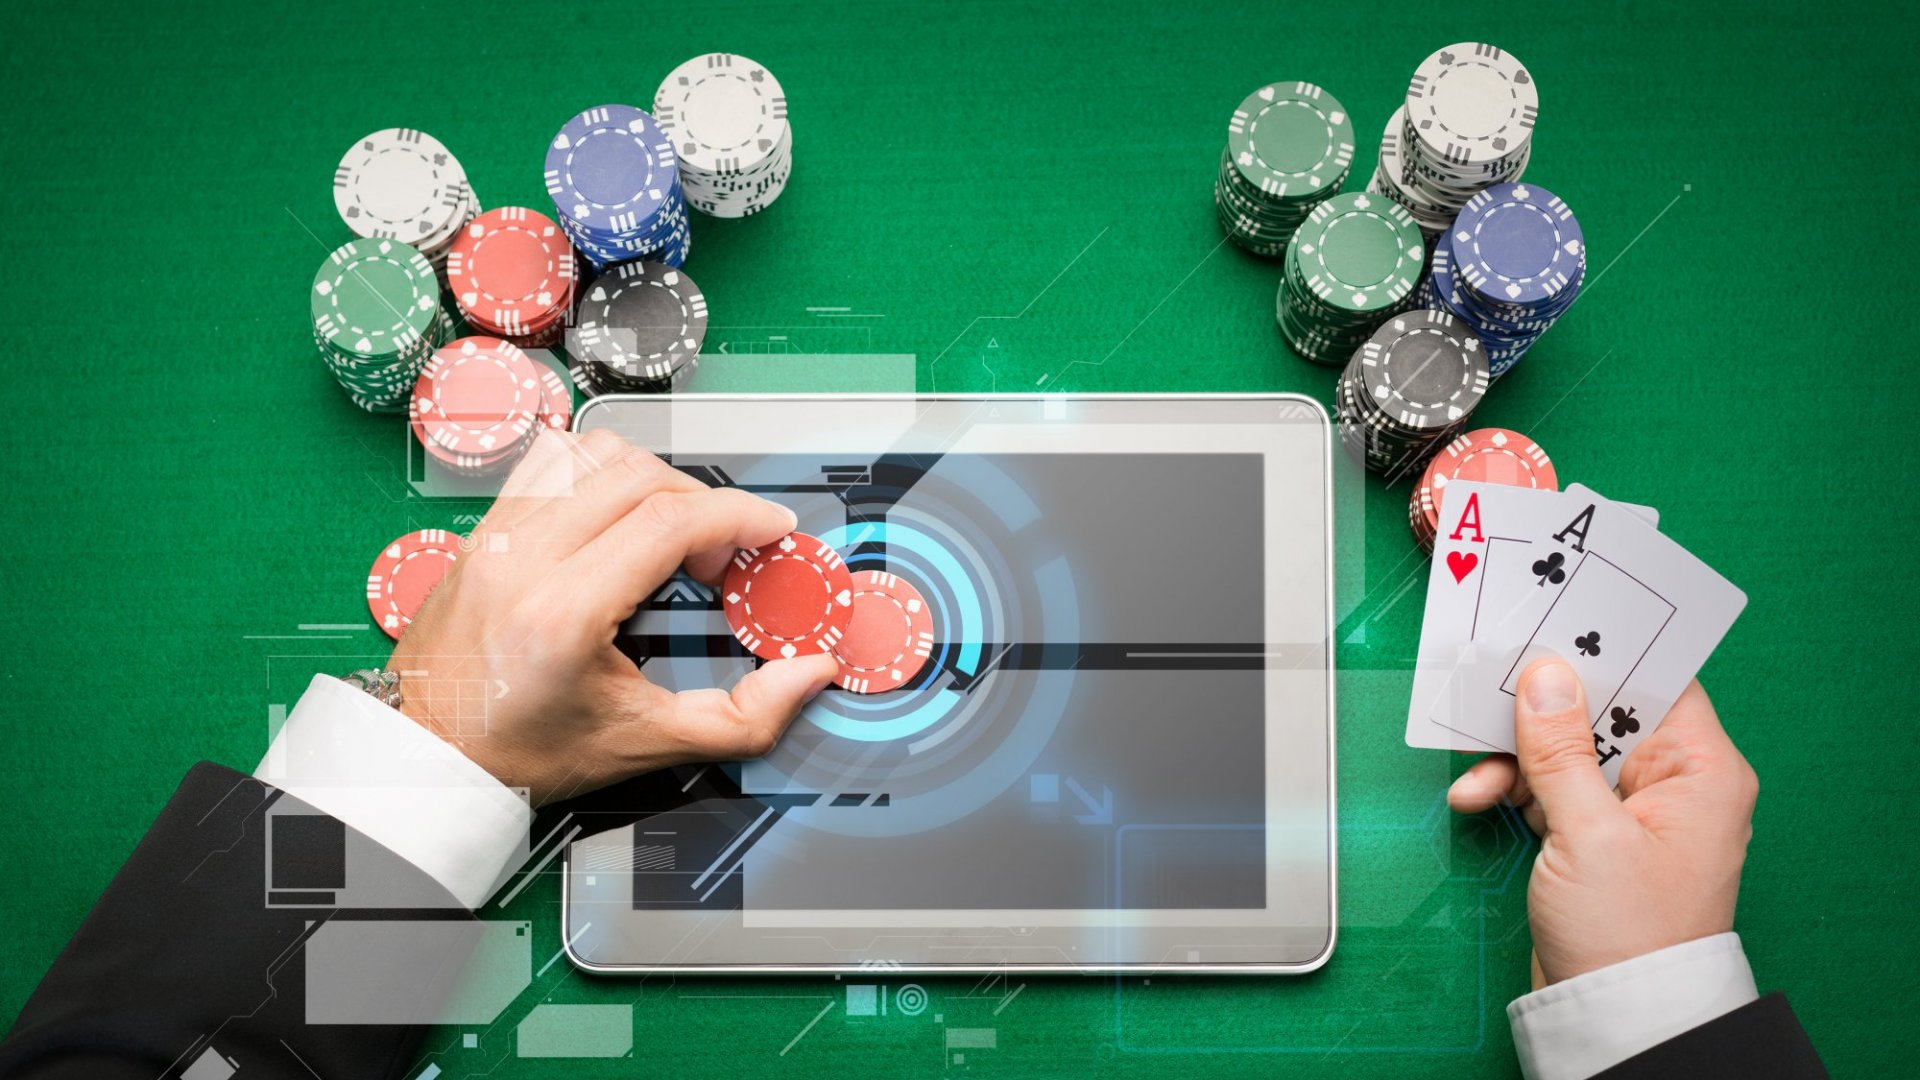 Is Online Casino Making Me Wealthy